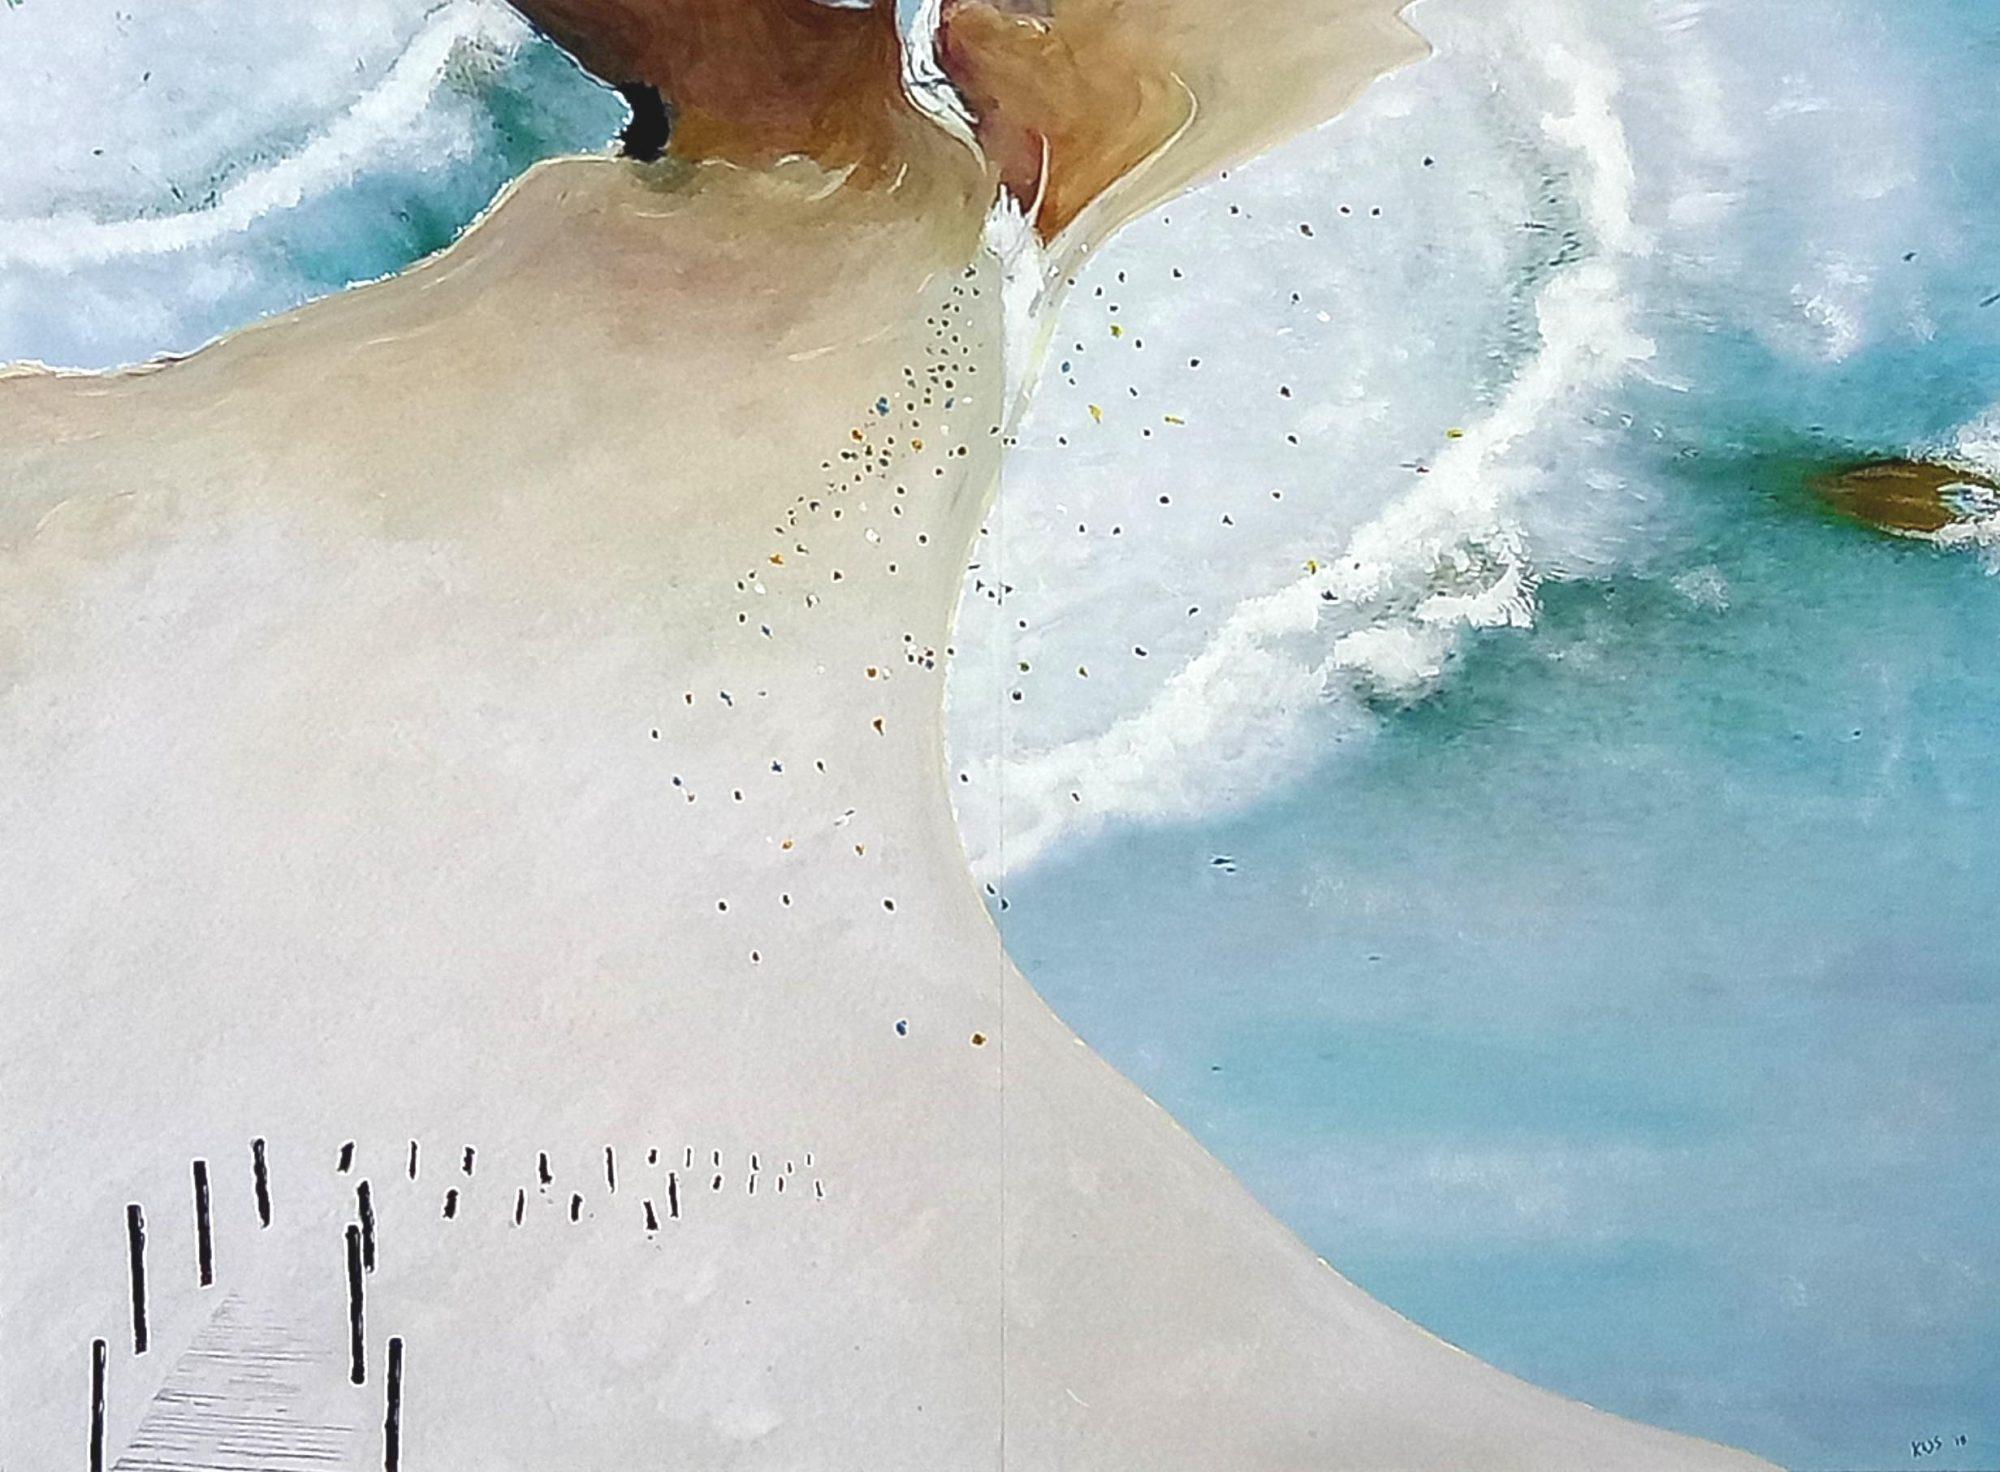 Lifes a Beach unframed